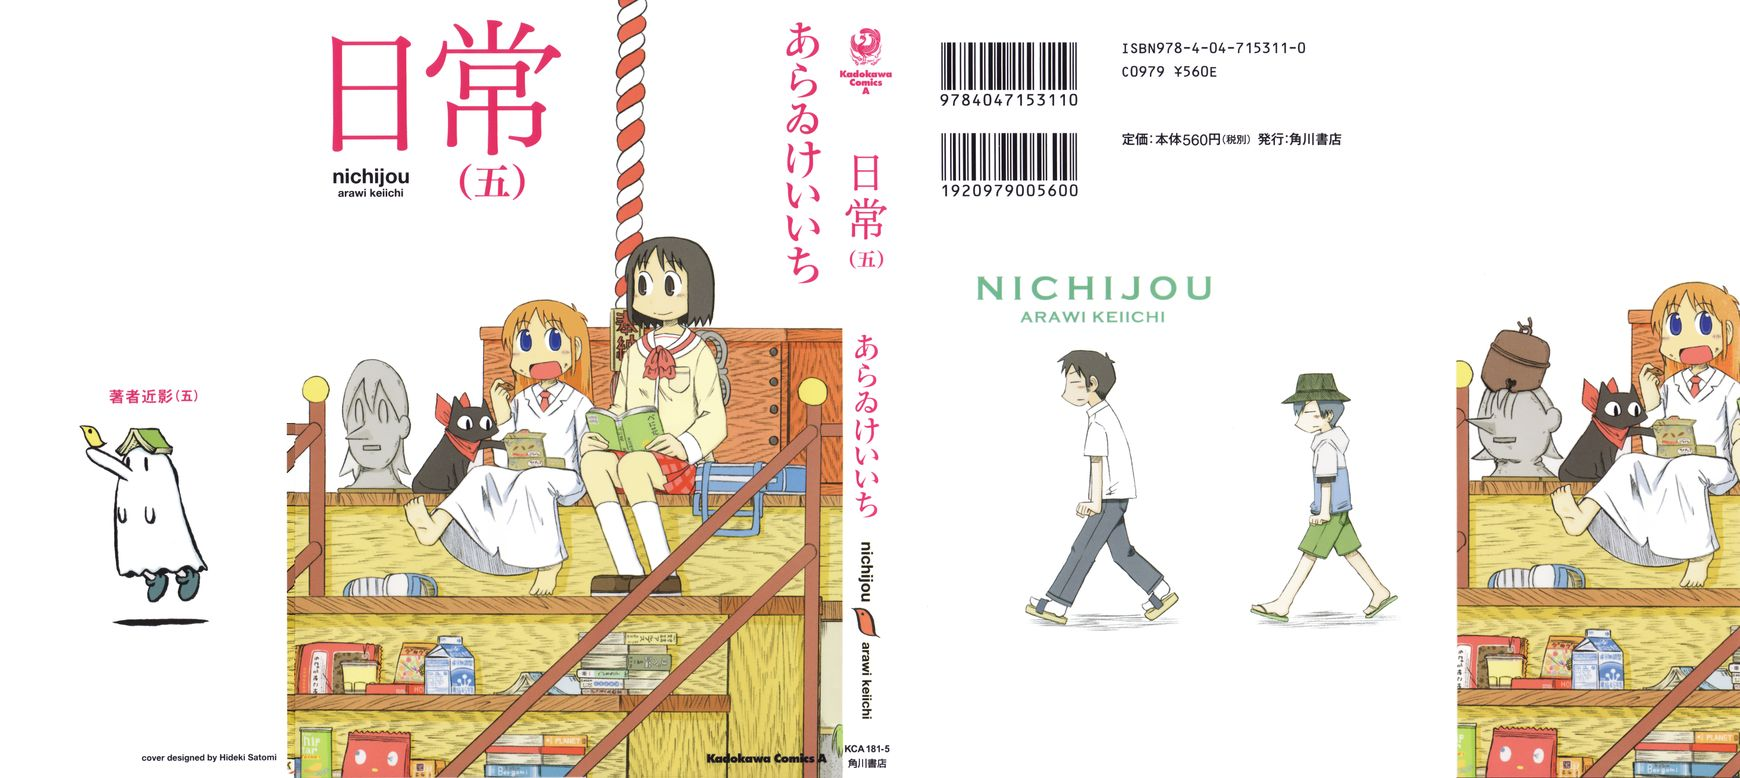 Nichijou 73 Page 1